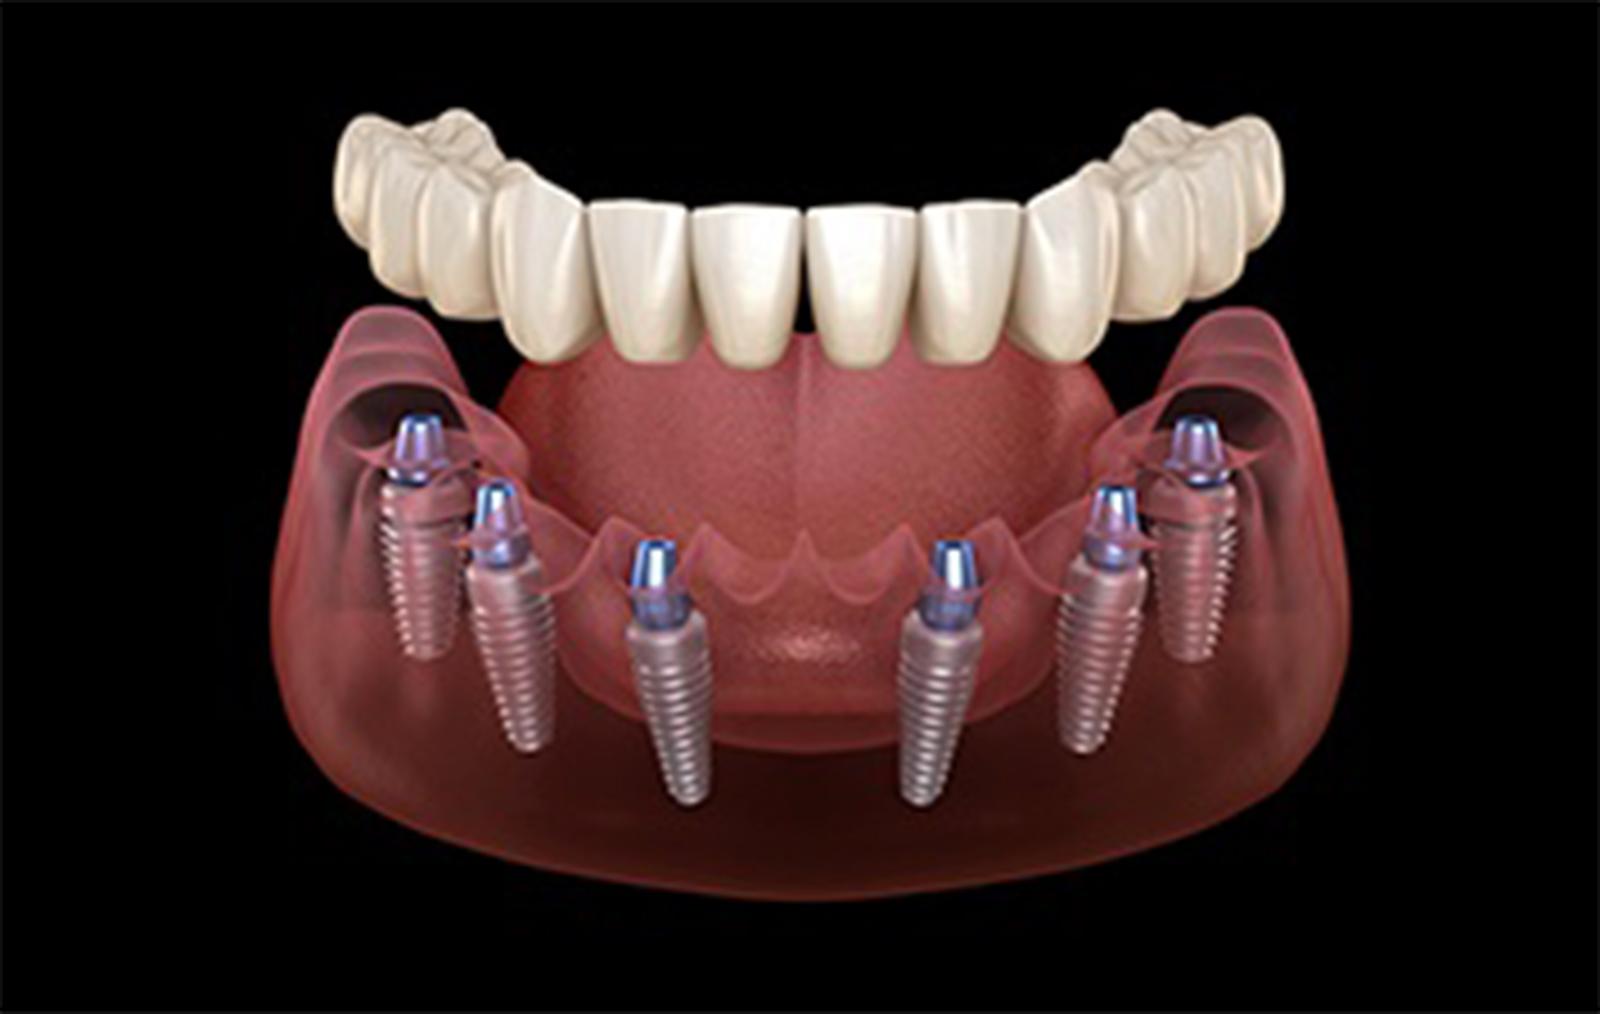 impianto dentale all in 6